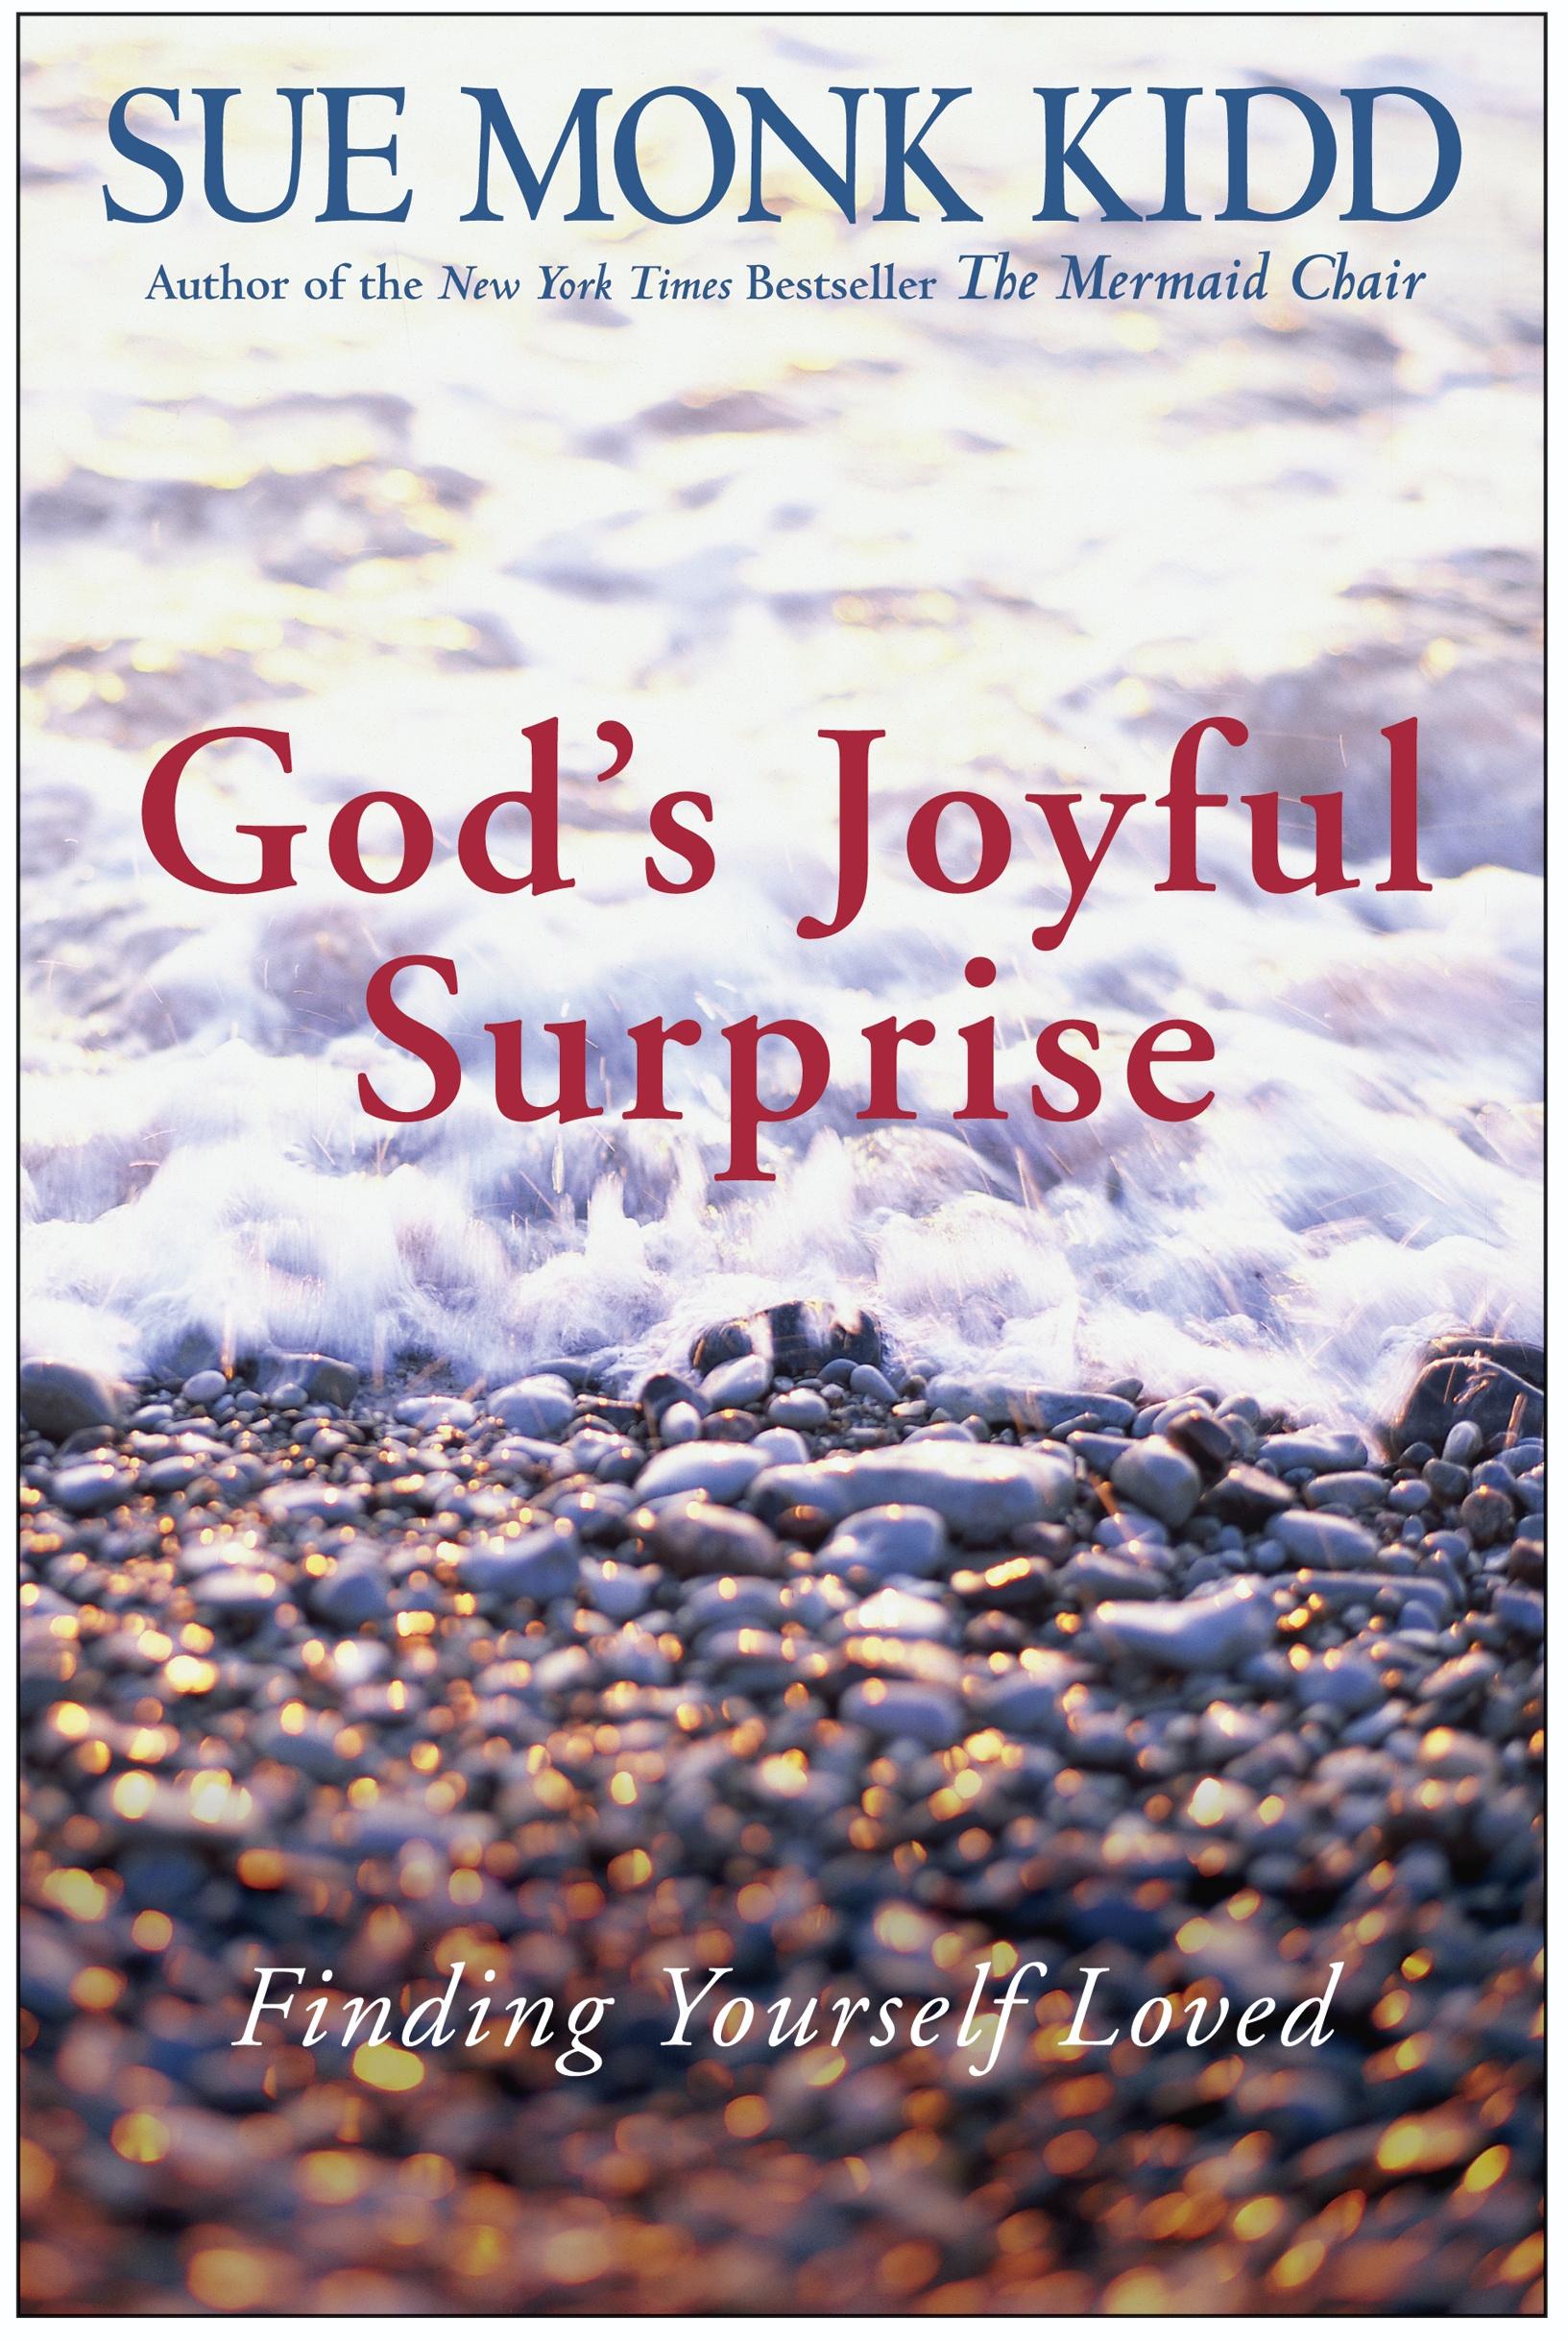 Gods Joyful Surprise : Finding Yourself Loved